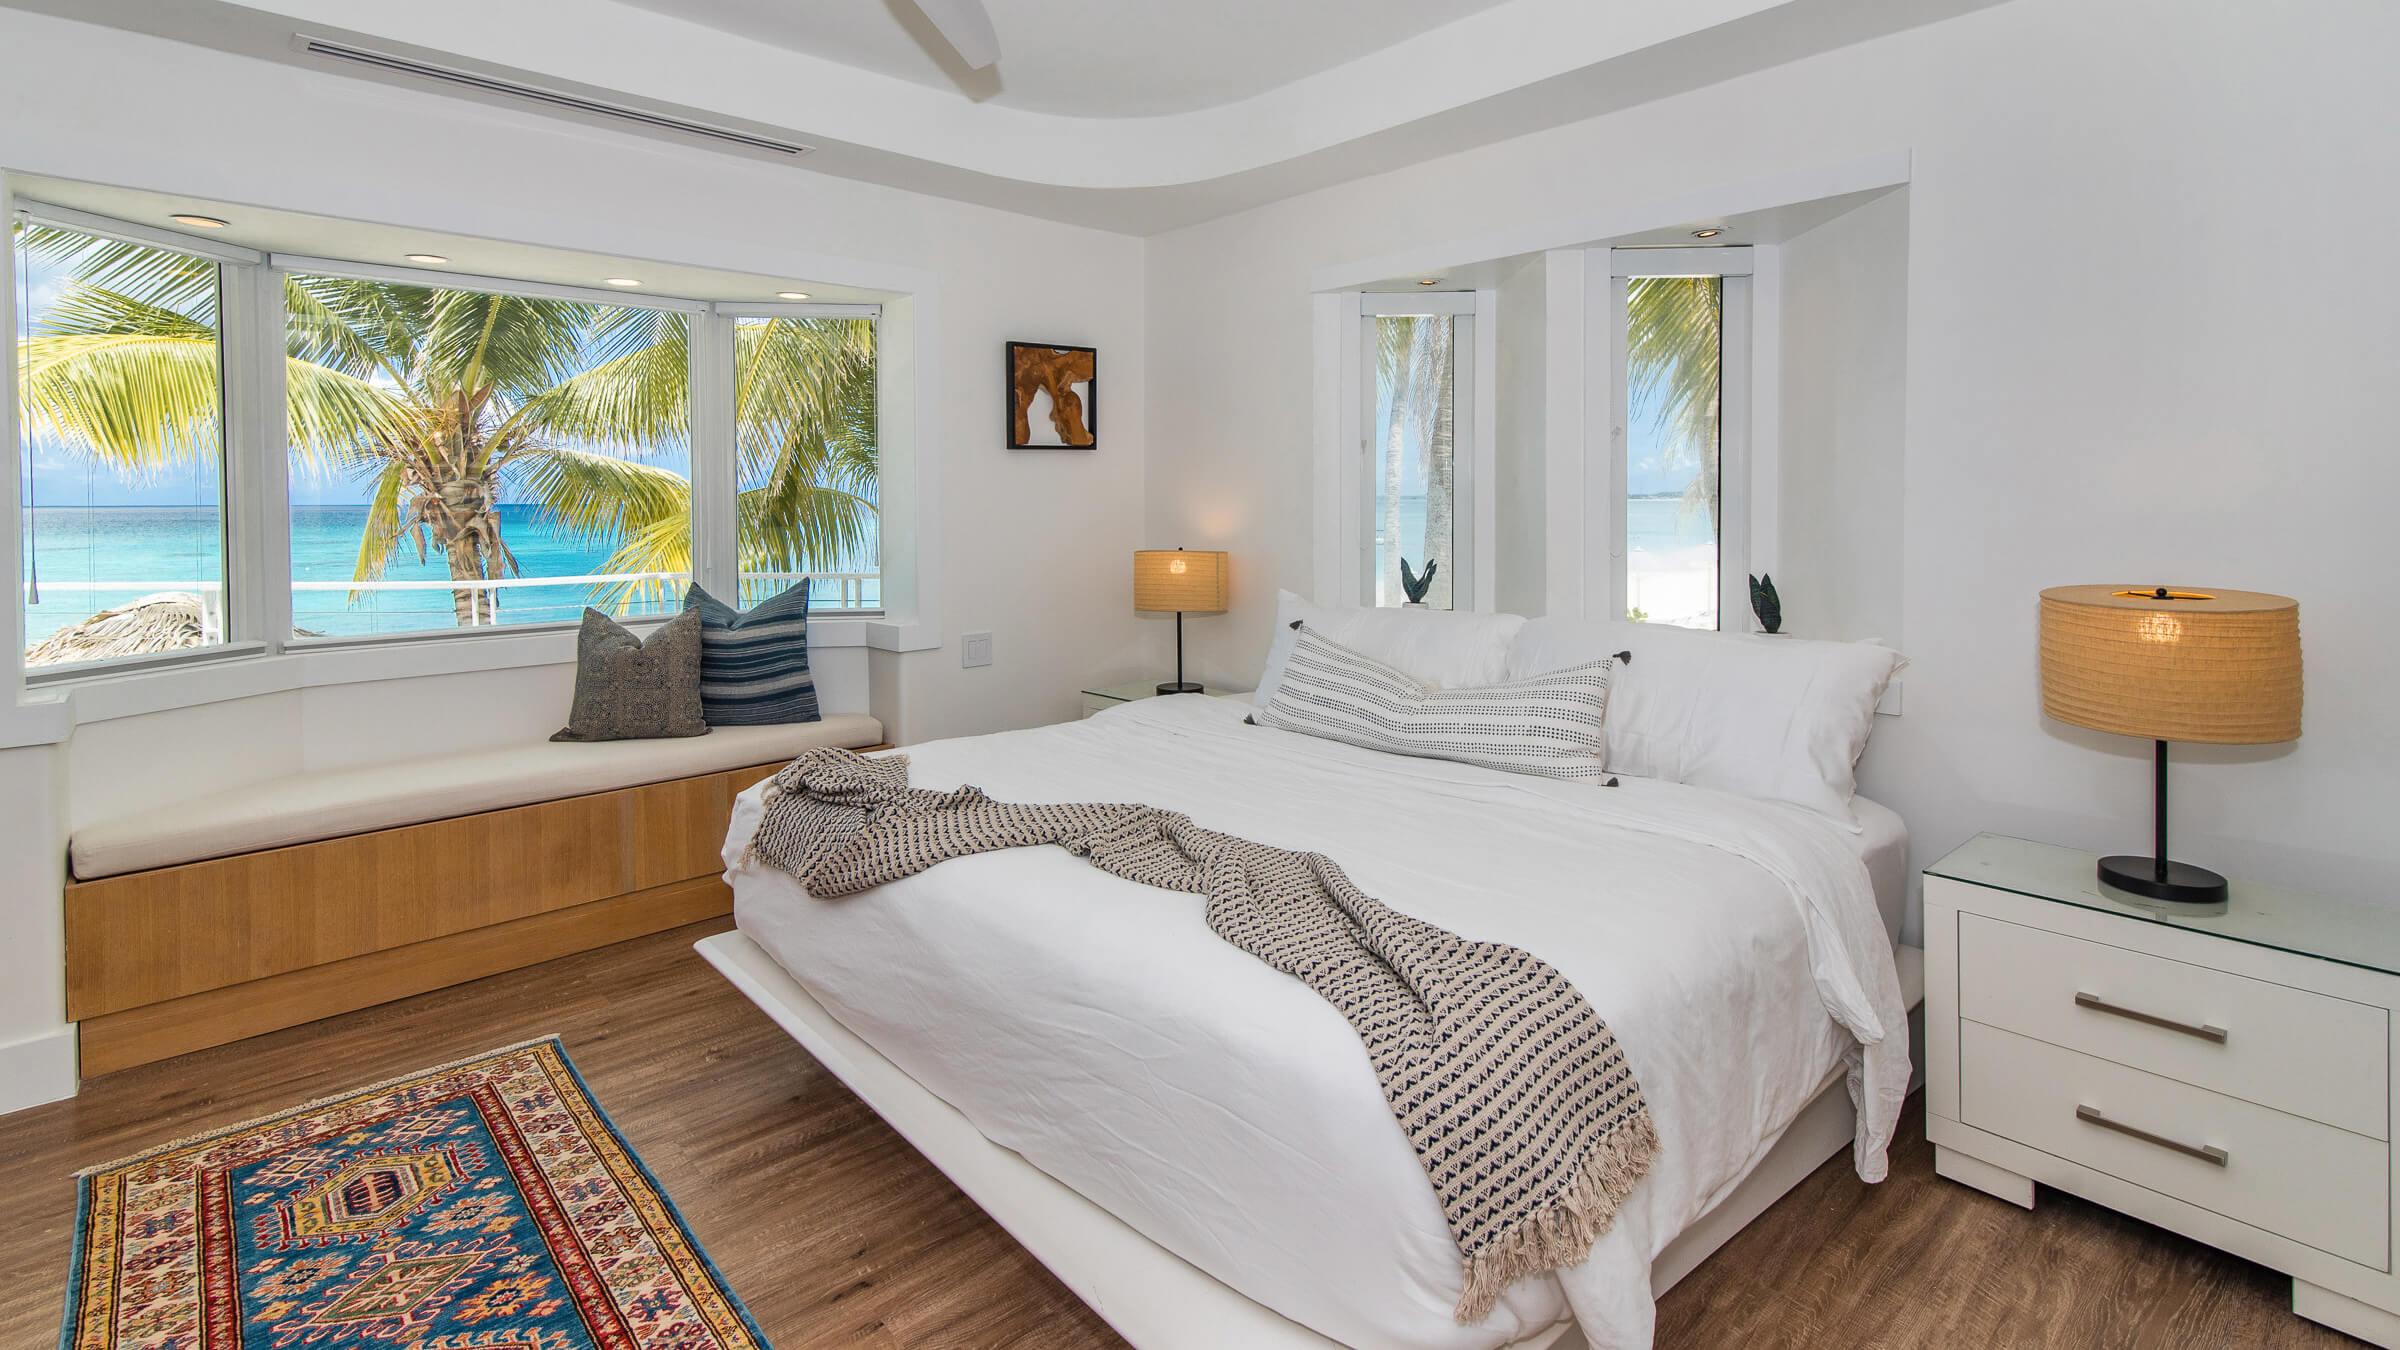 Seascape-Villa-Beach-Villa-Cayman-Islands-Grand-Cayman-Paradise-Bedroom-with-View.jpg